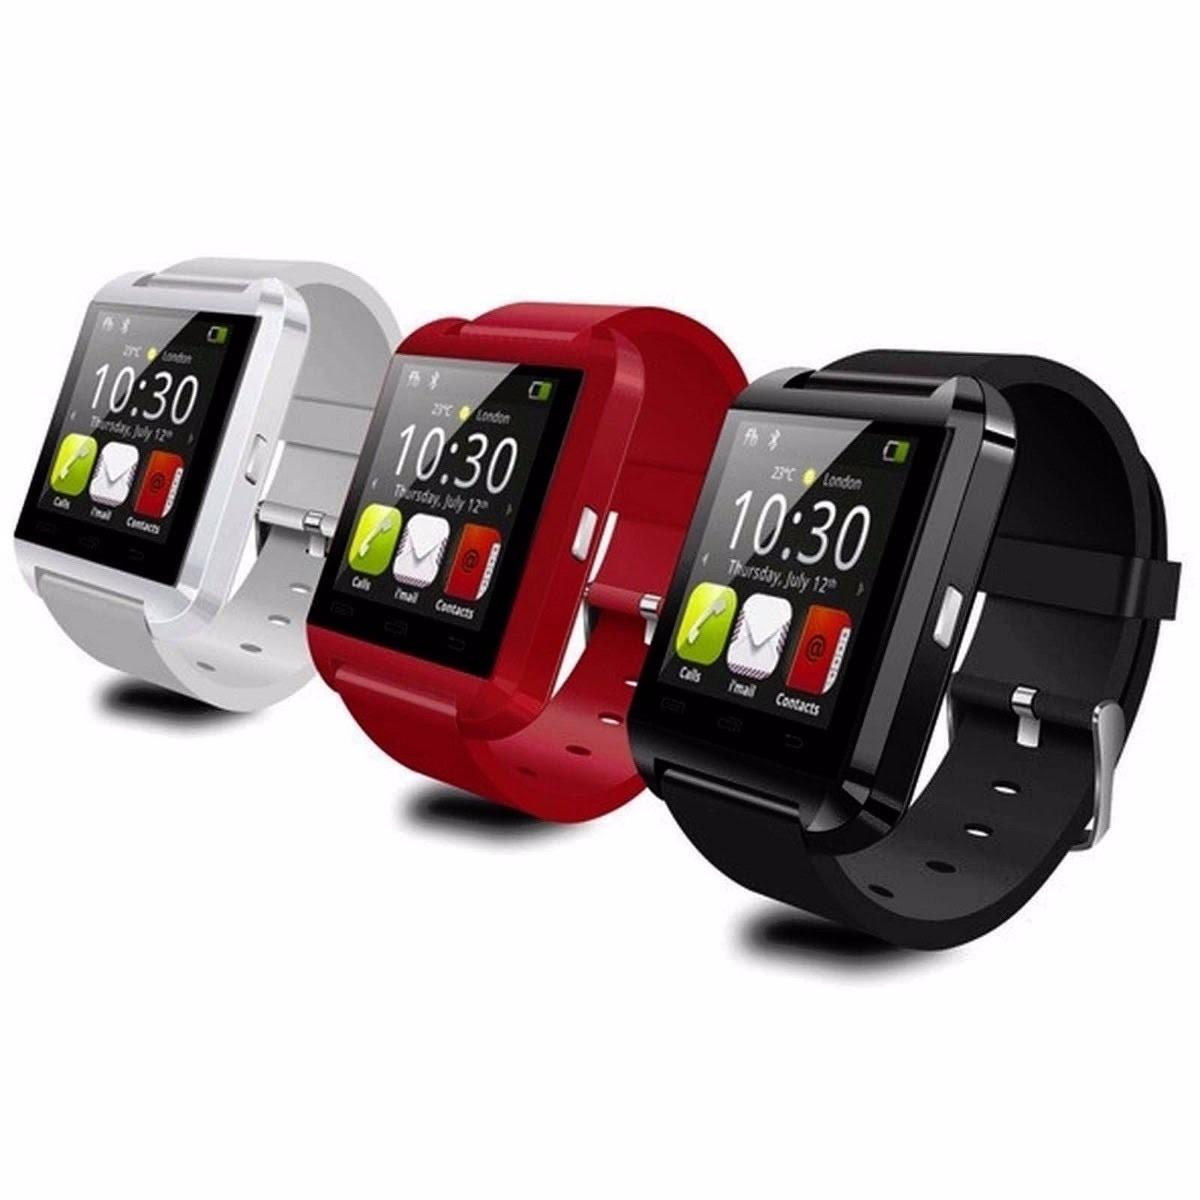 847f55936fb relógio smartwatch u8 inteligente bluetooth android iphone. Carregando zoom.